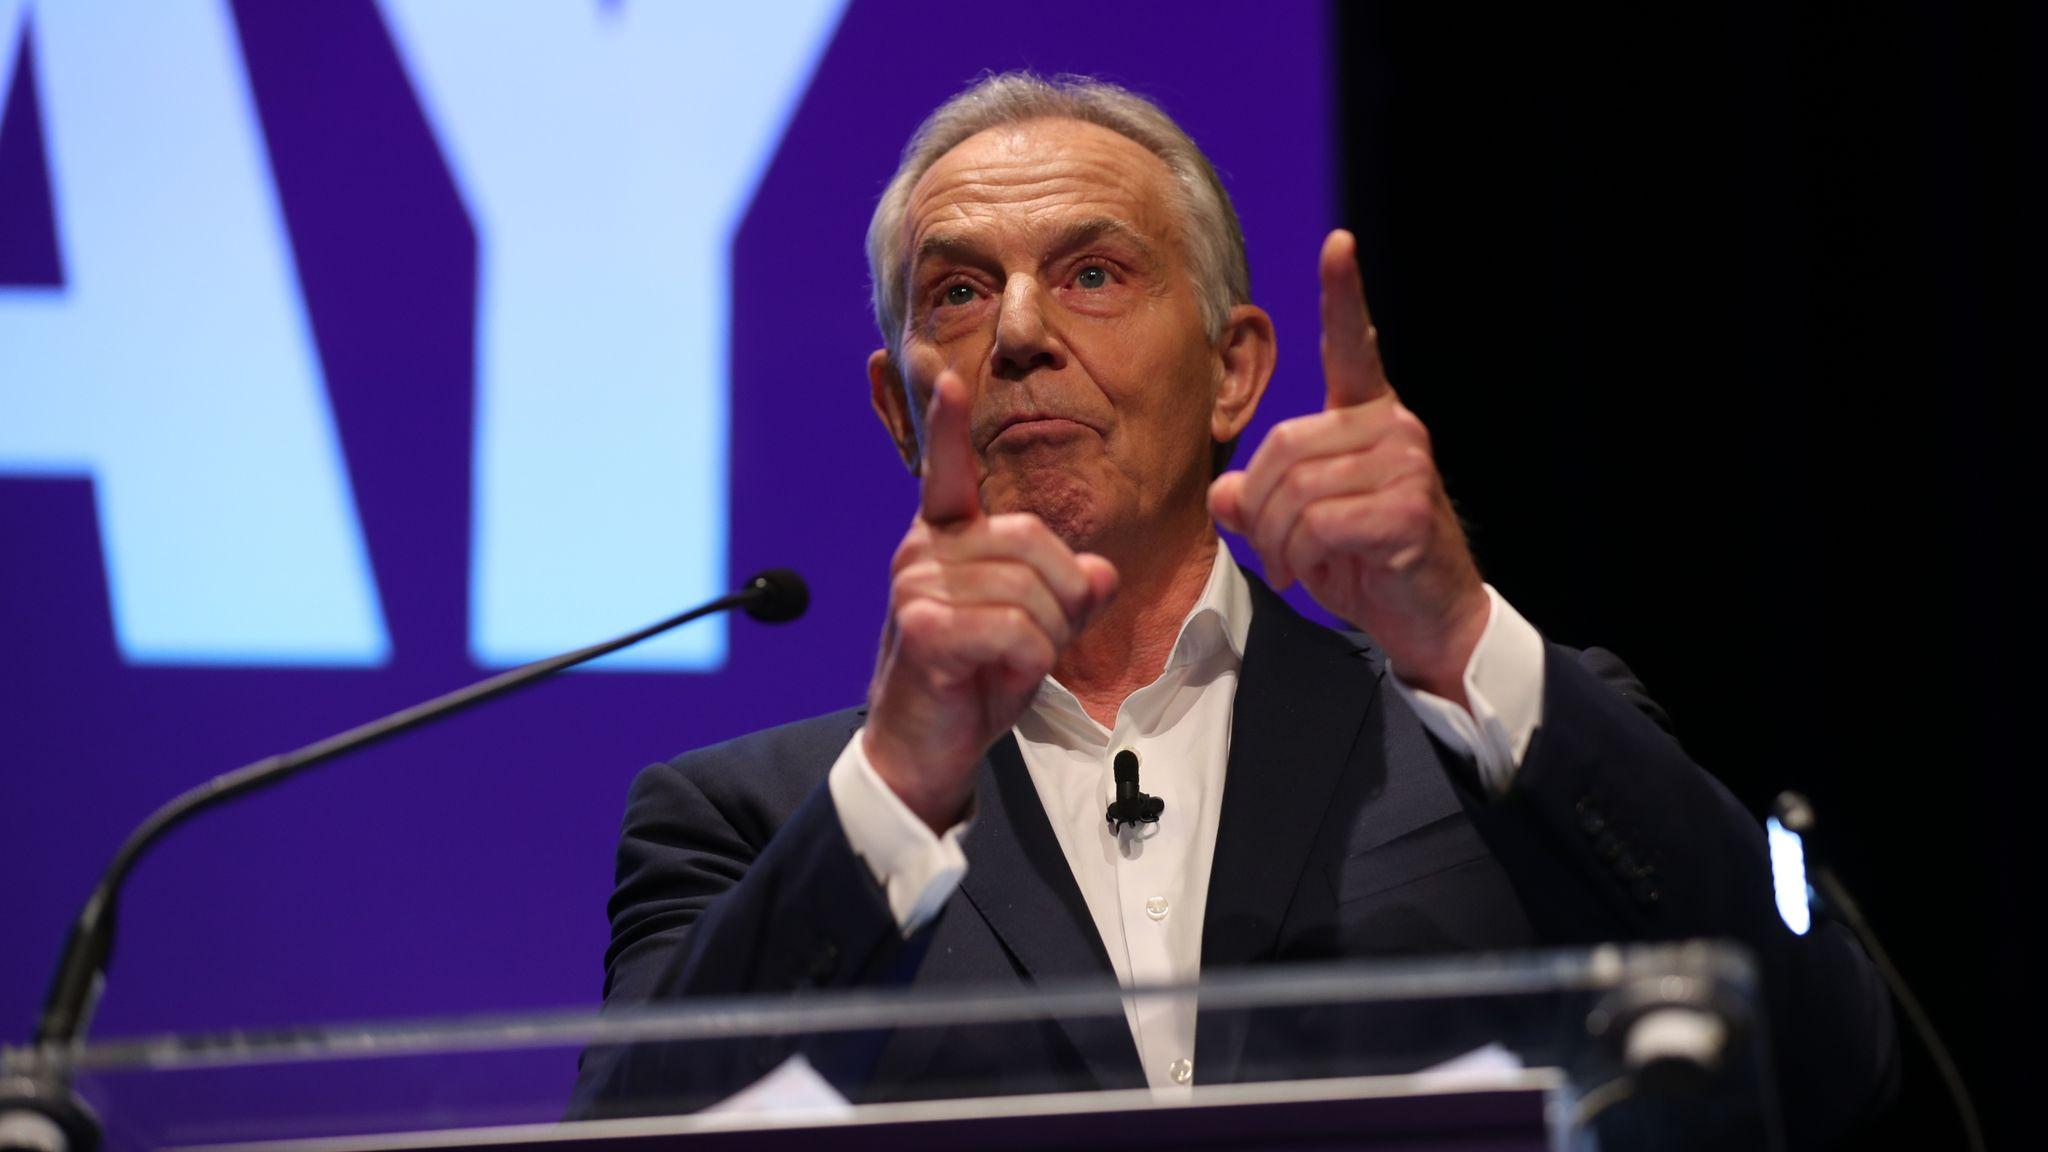 General election: 'Thank God for John Major' - Tony Blair praises predecessor's Brexit intervention